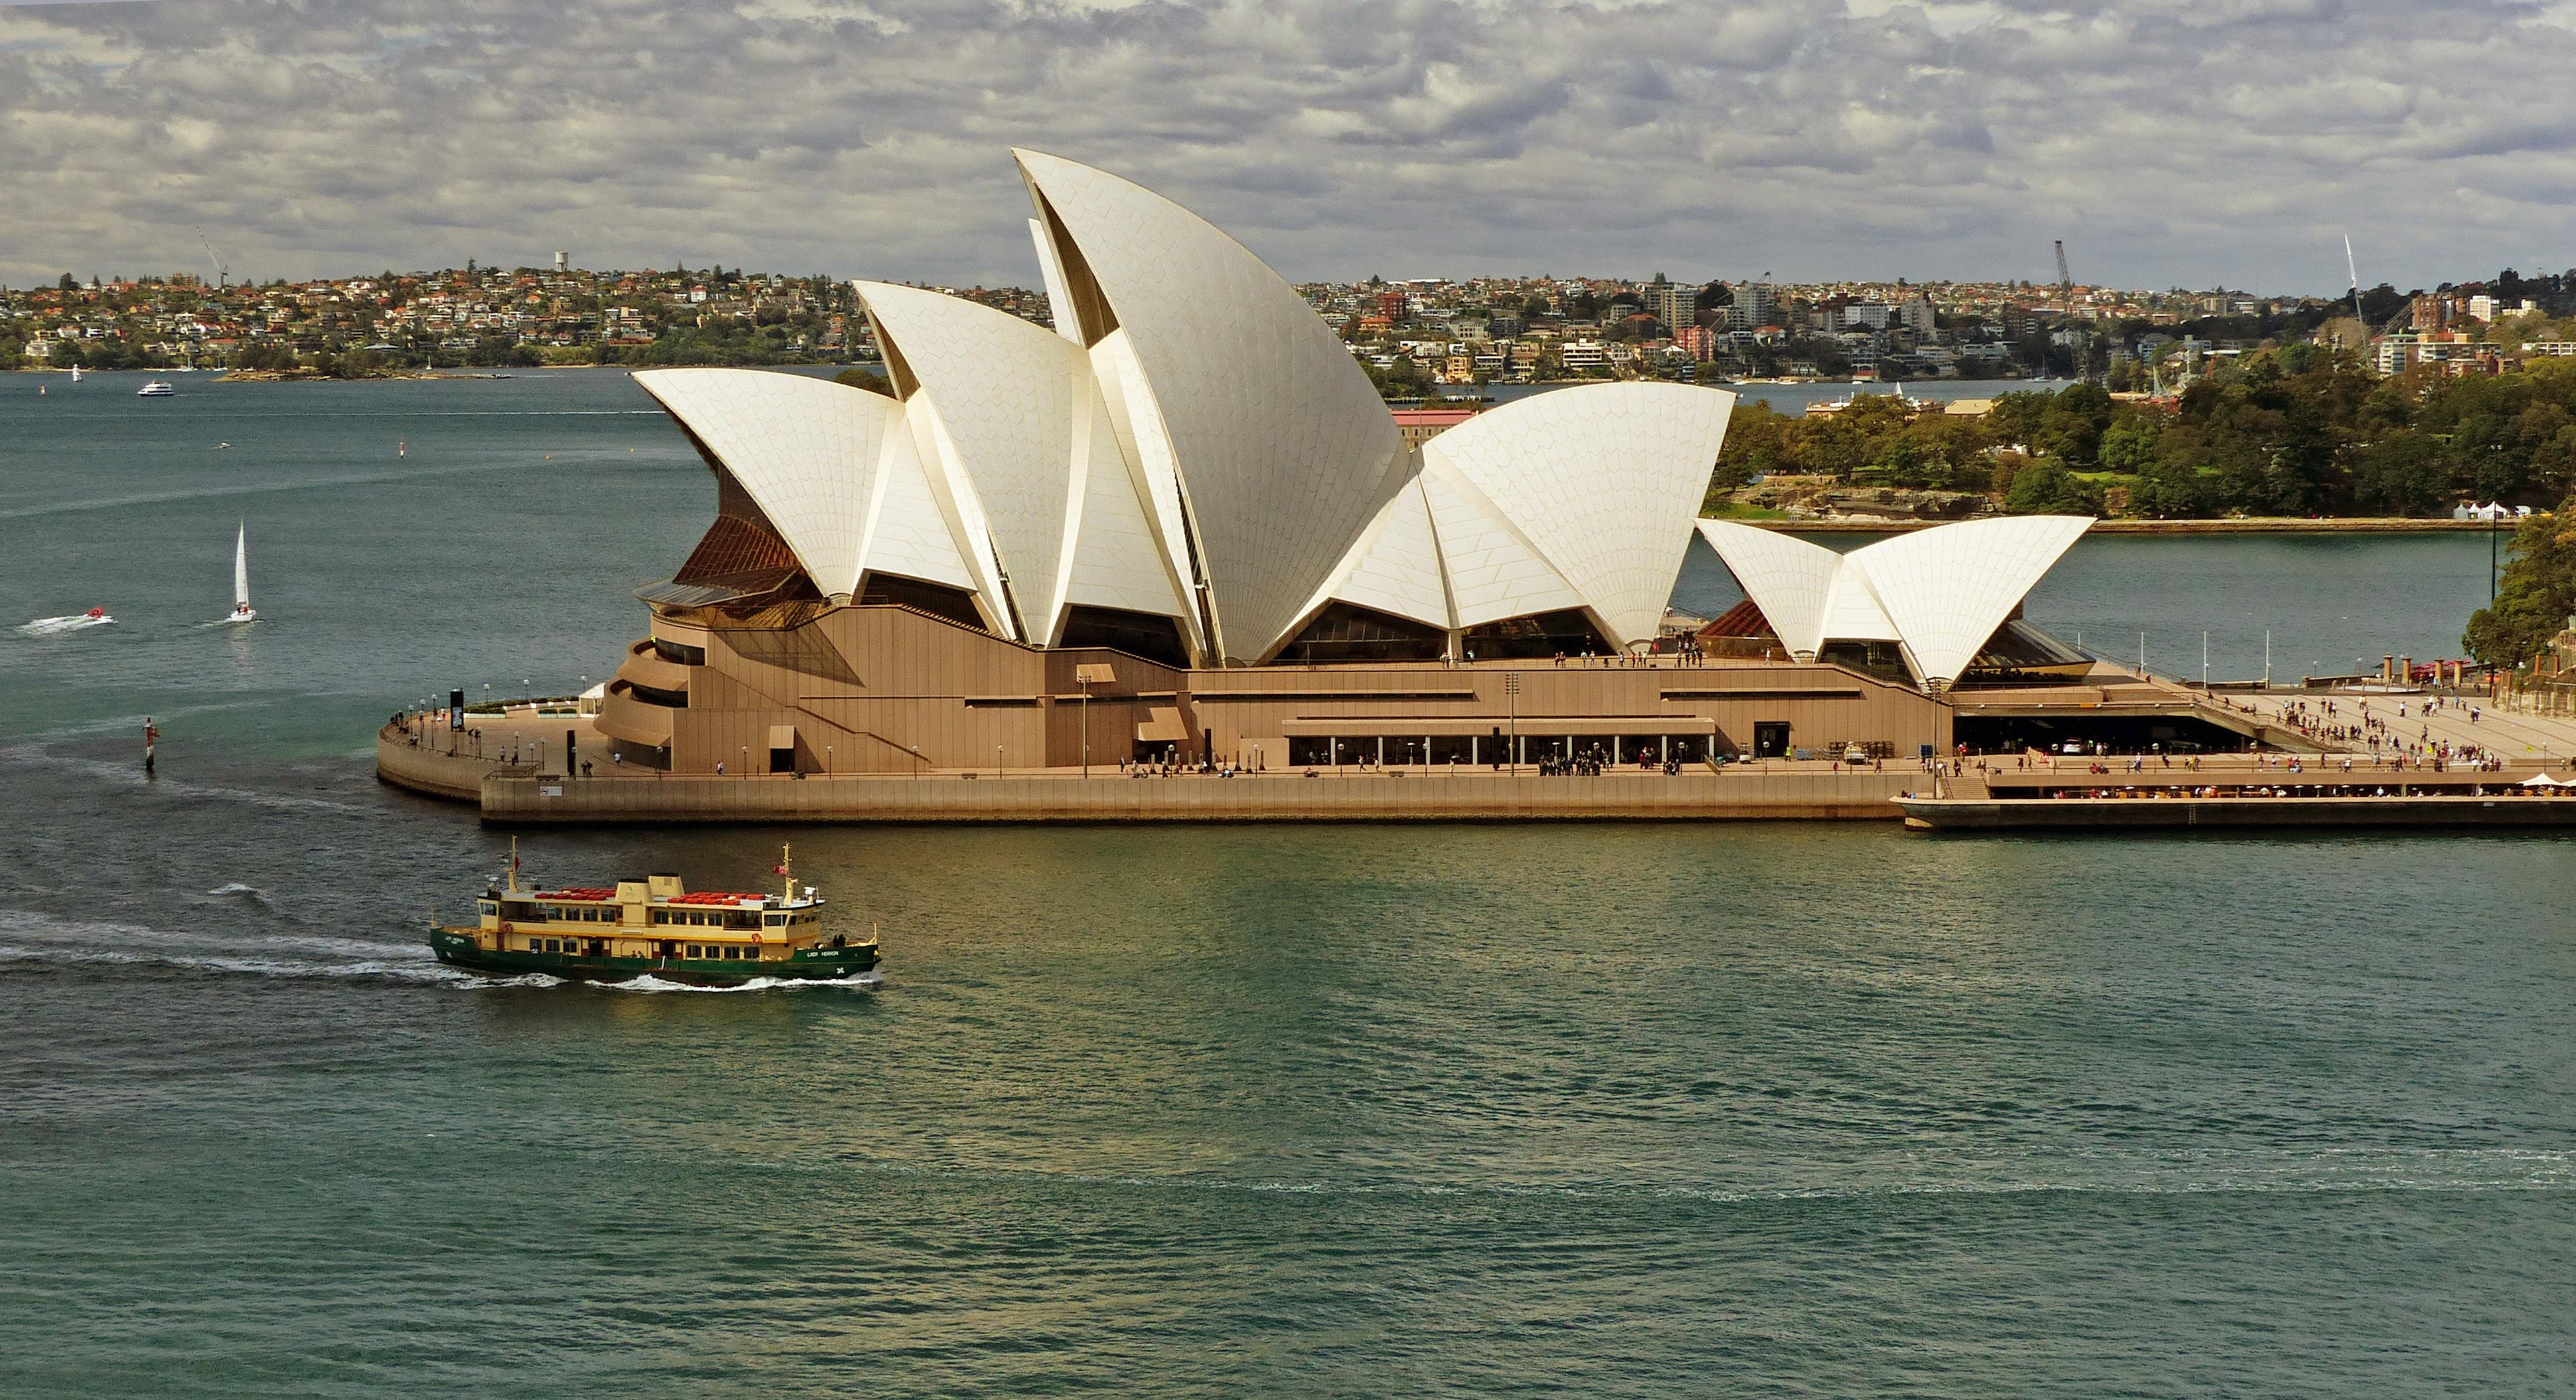 The Sydney Opera House., Boat, Boats, Buildings, Free photos, HQ Photo